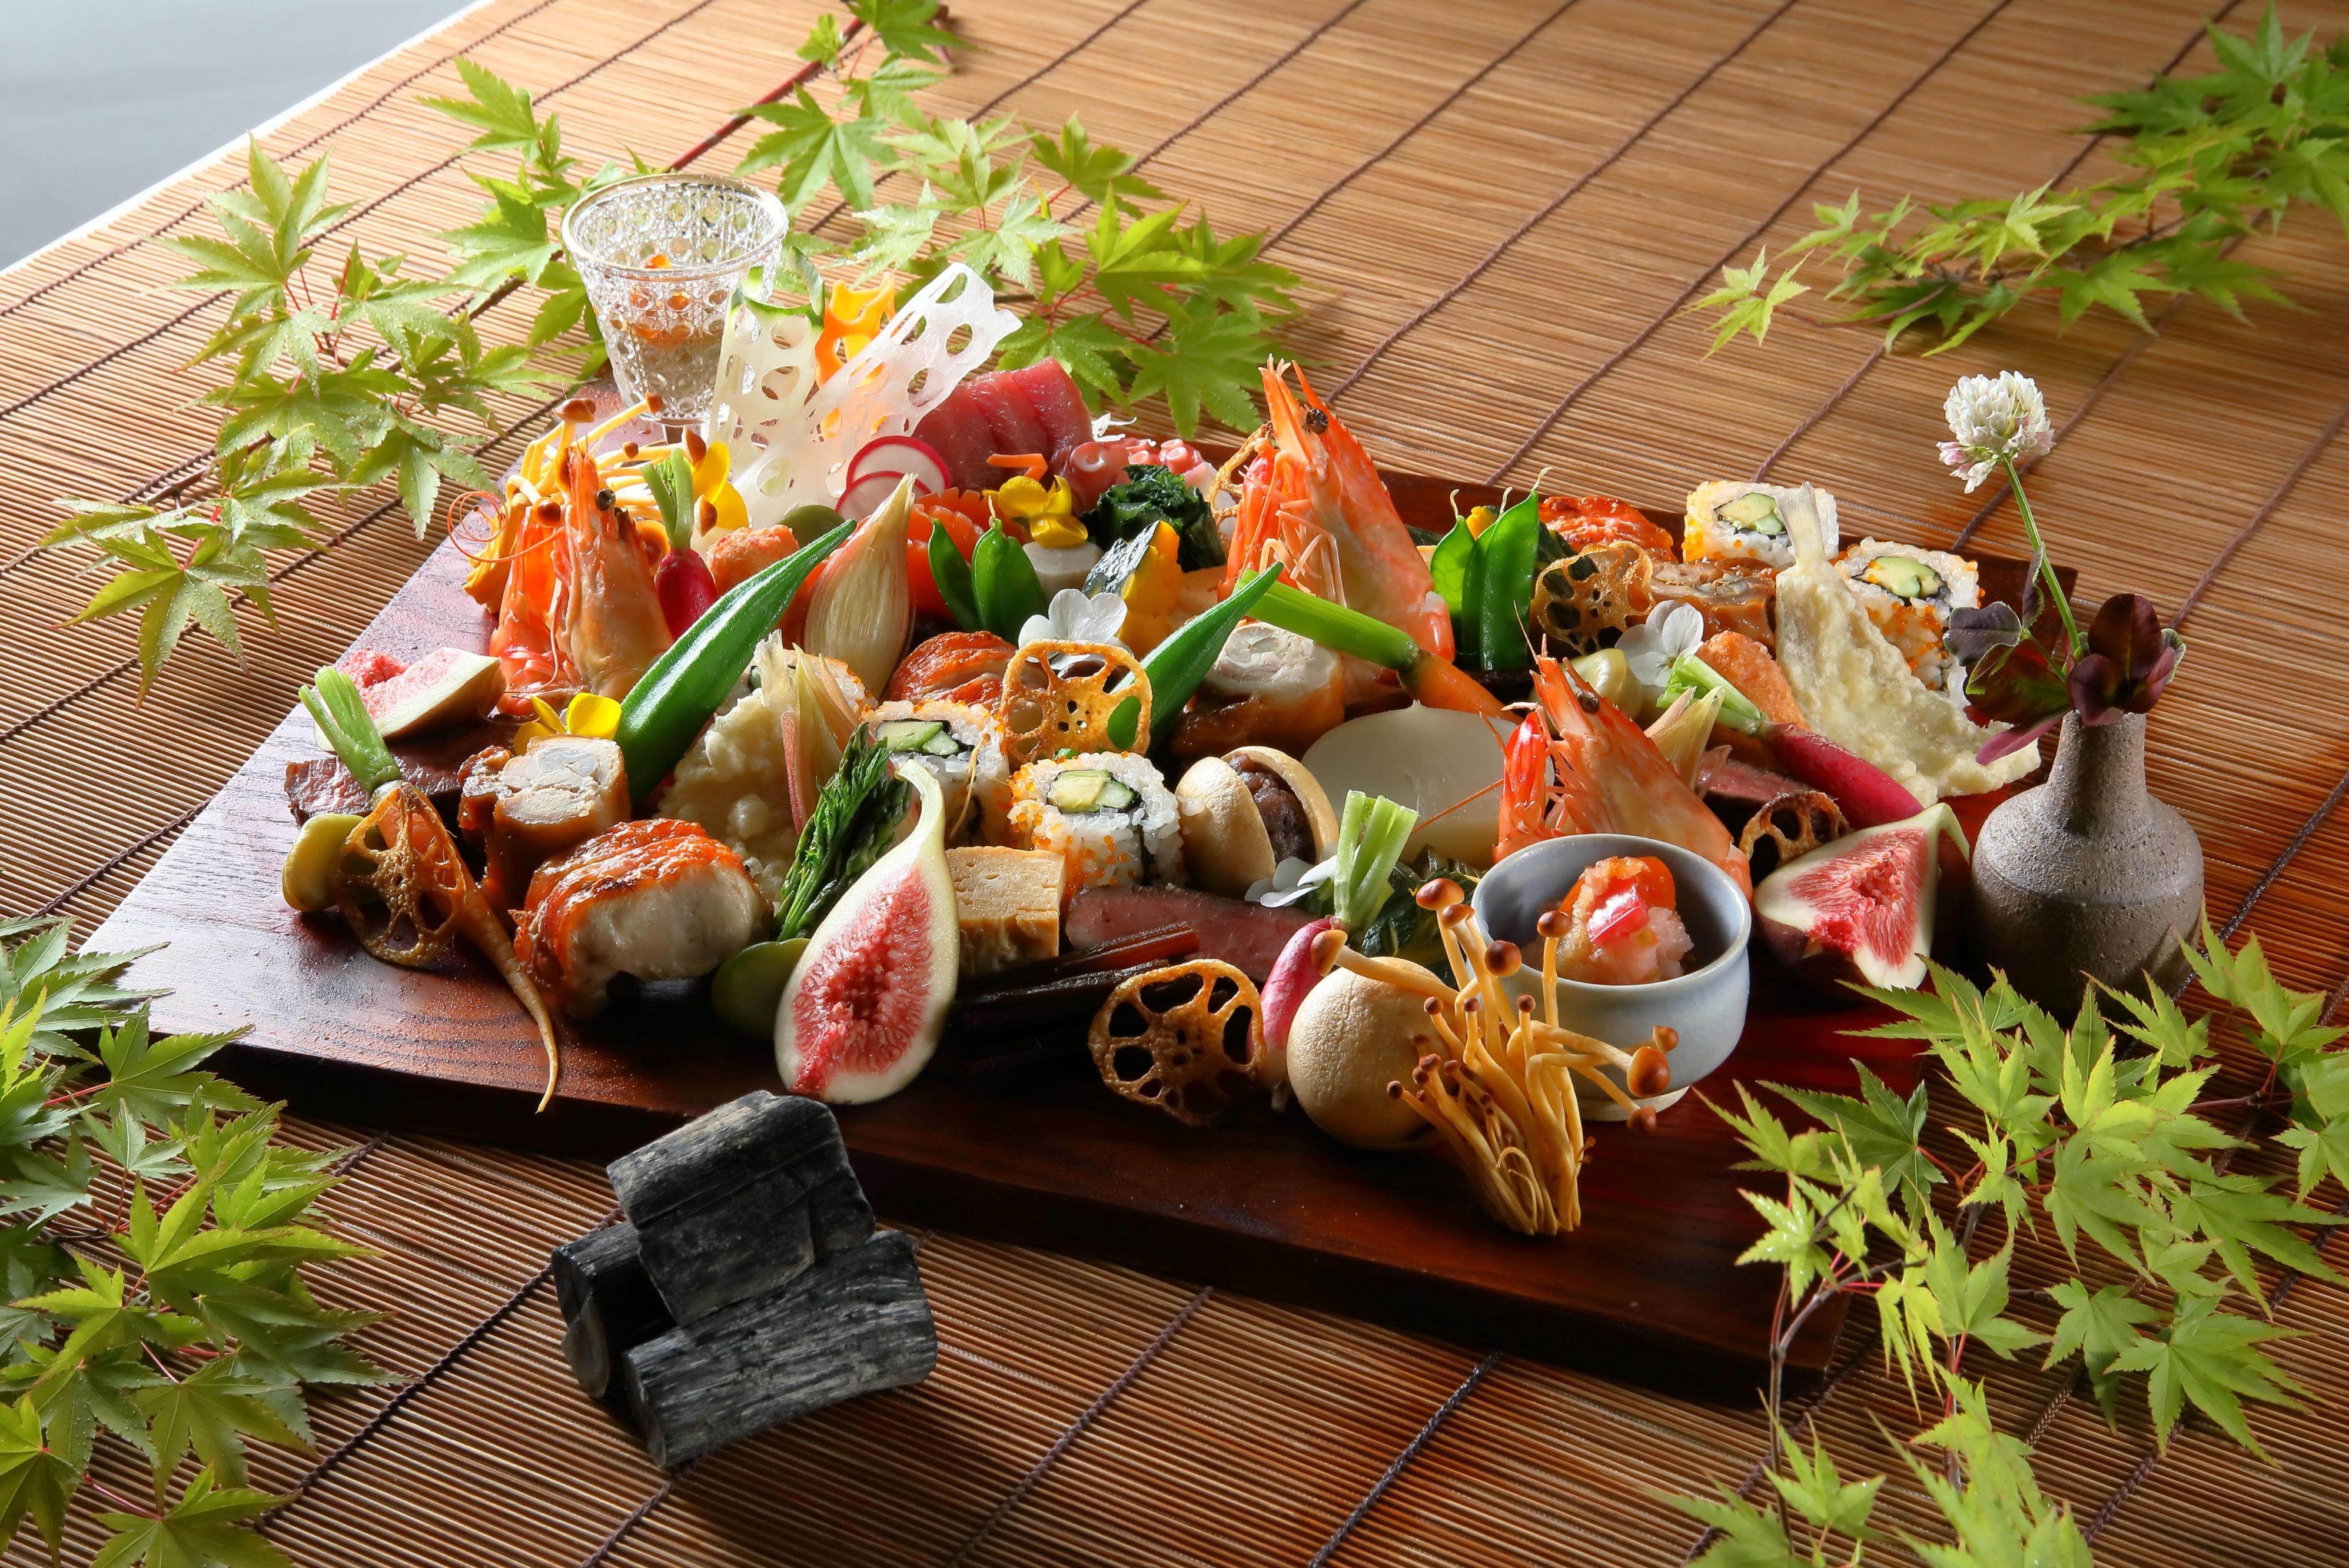 【長野・軽井沢】信州食材とお酒探訪の旅(農園見学・収穫体験・懐石料理付・6時間)